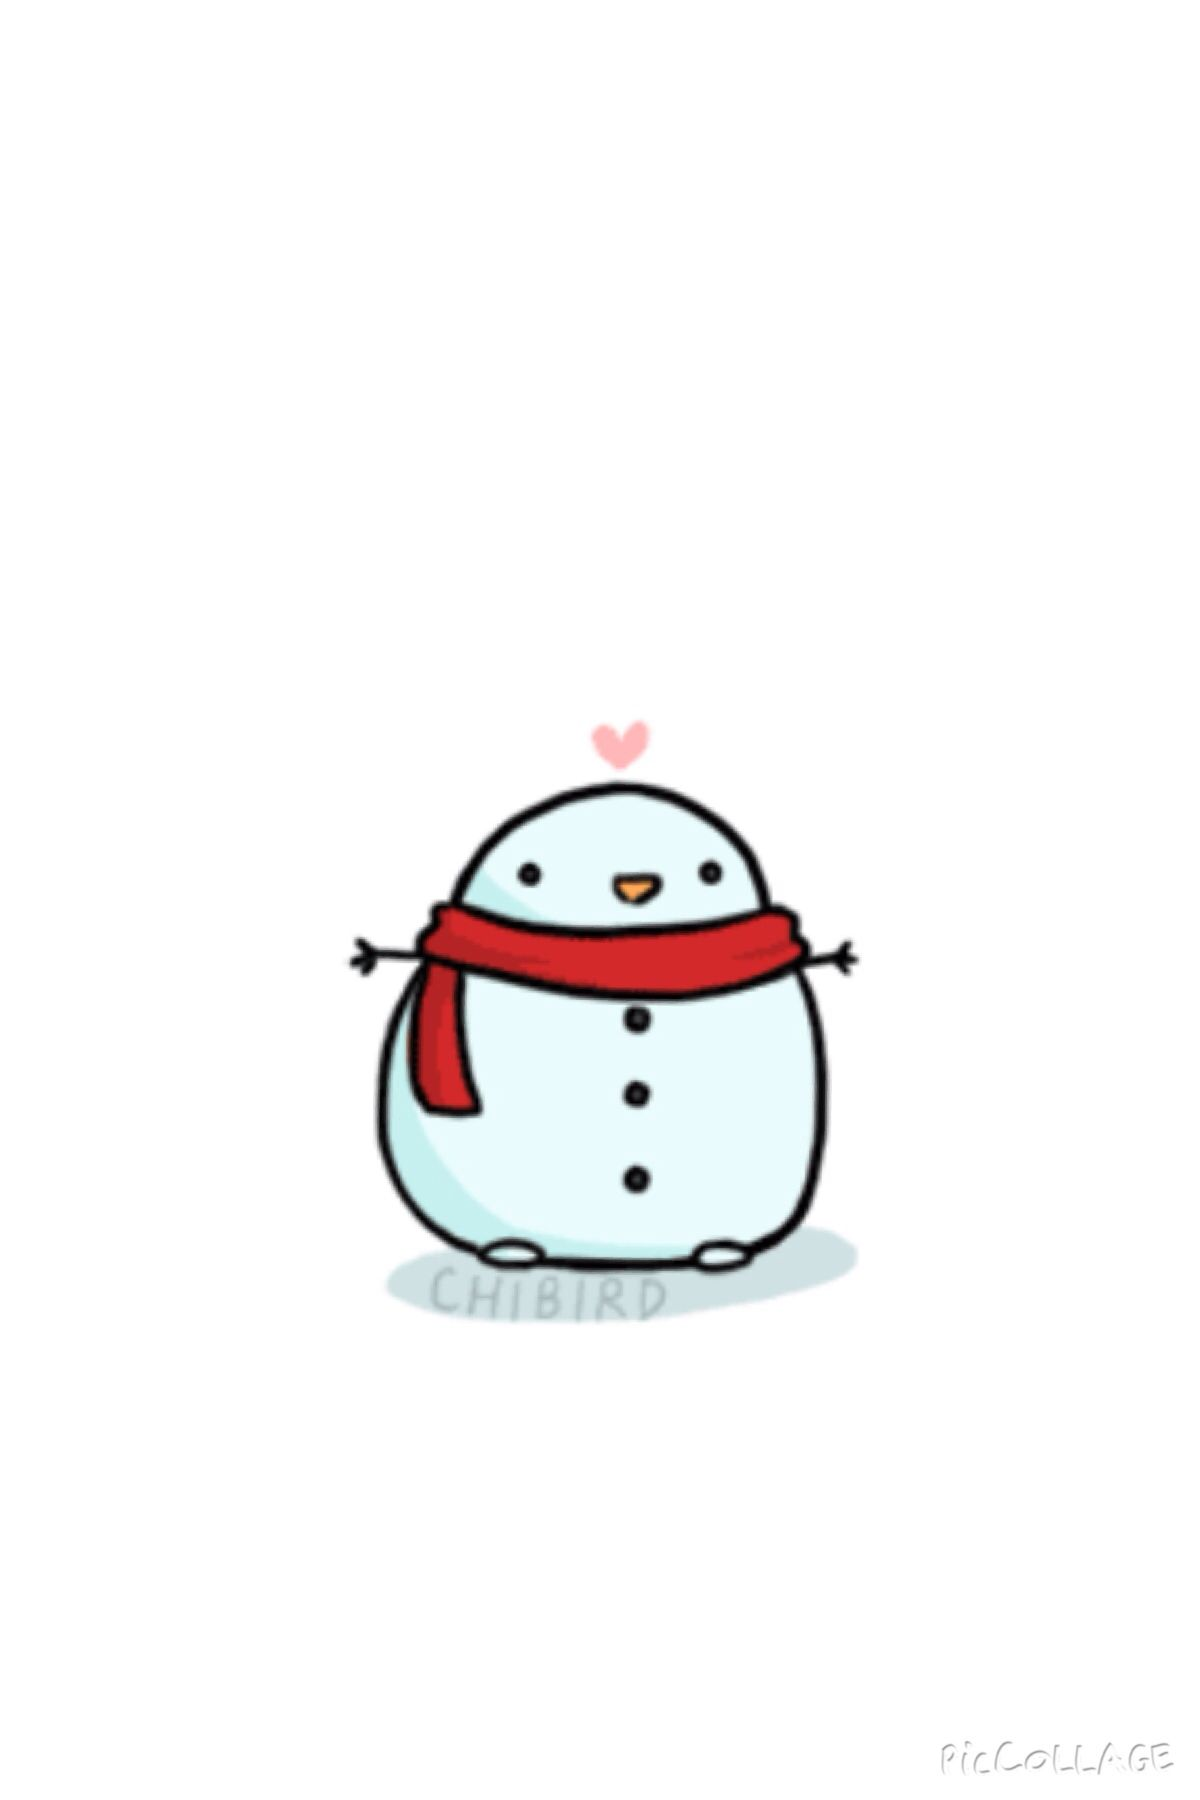 Chibird | Chibird, Cute puns, Cute quotes